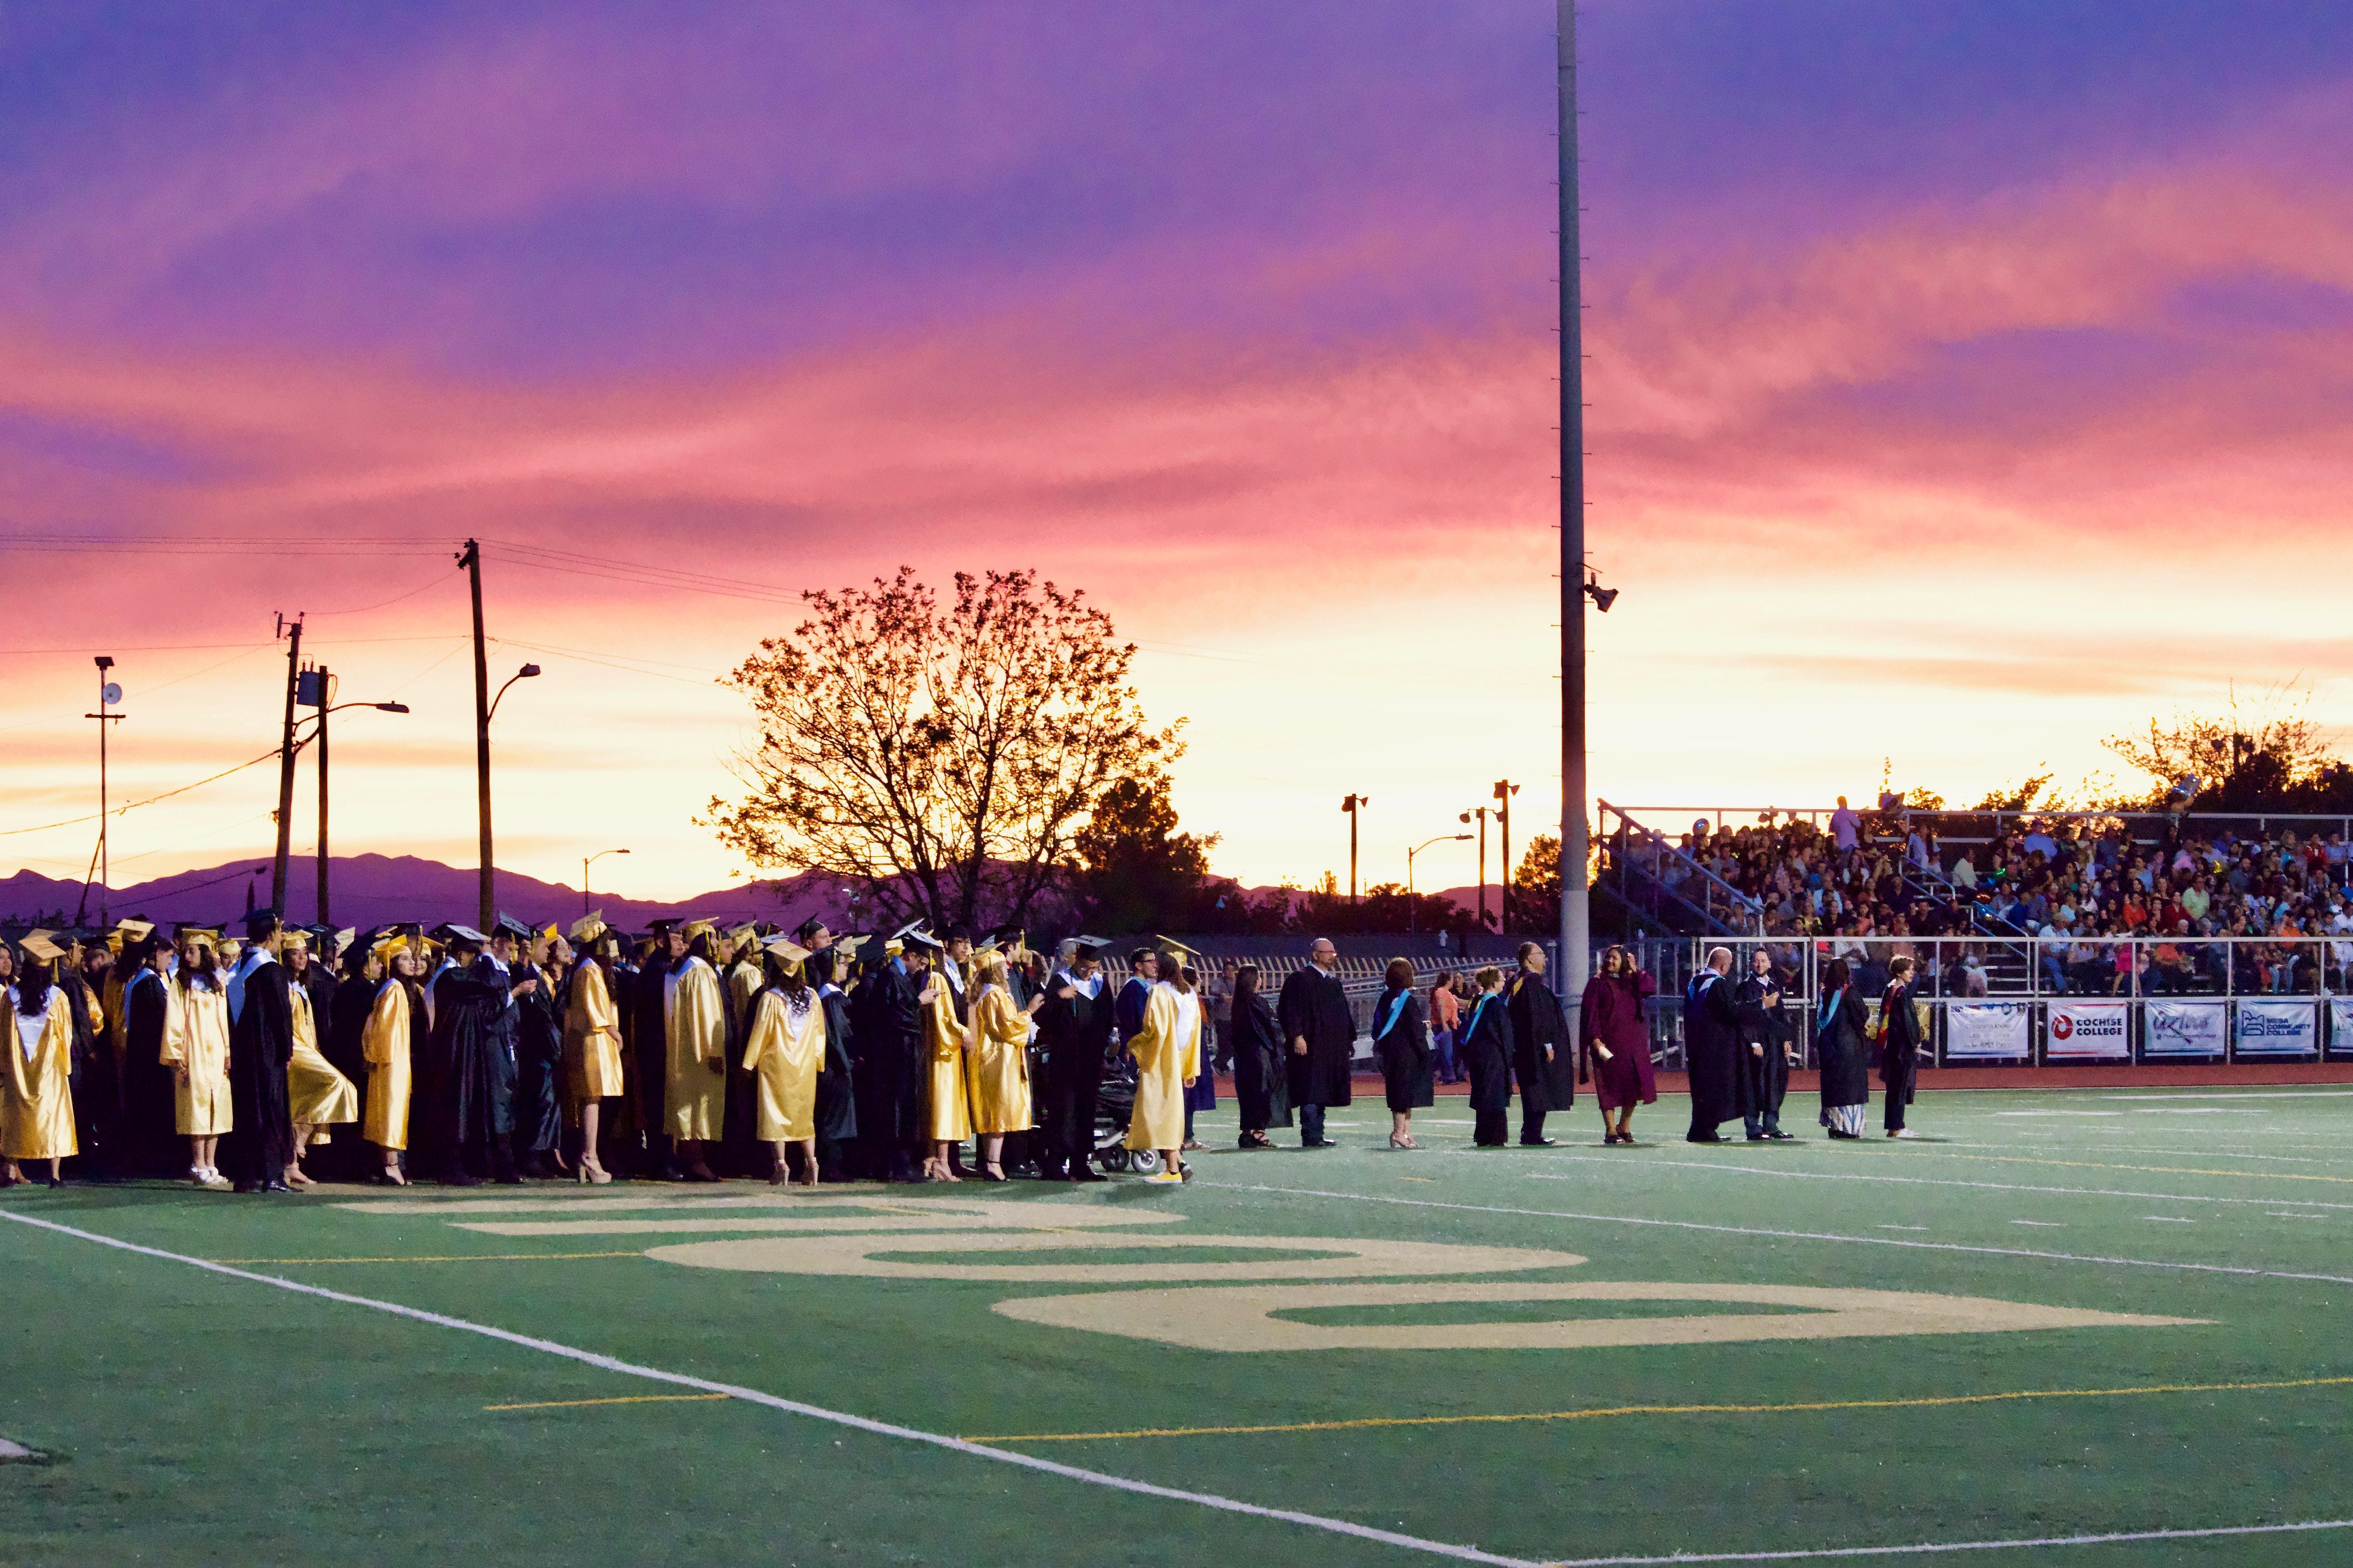 graduates gathered on football field